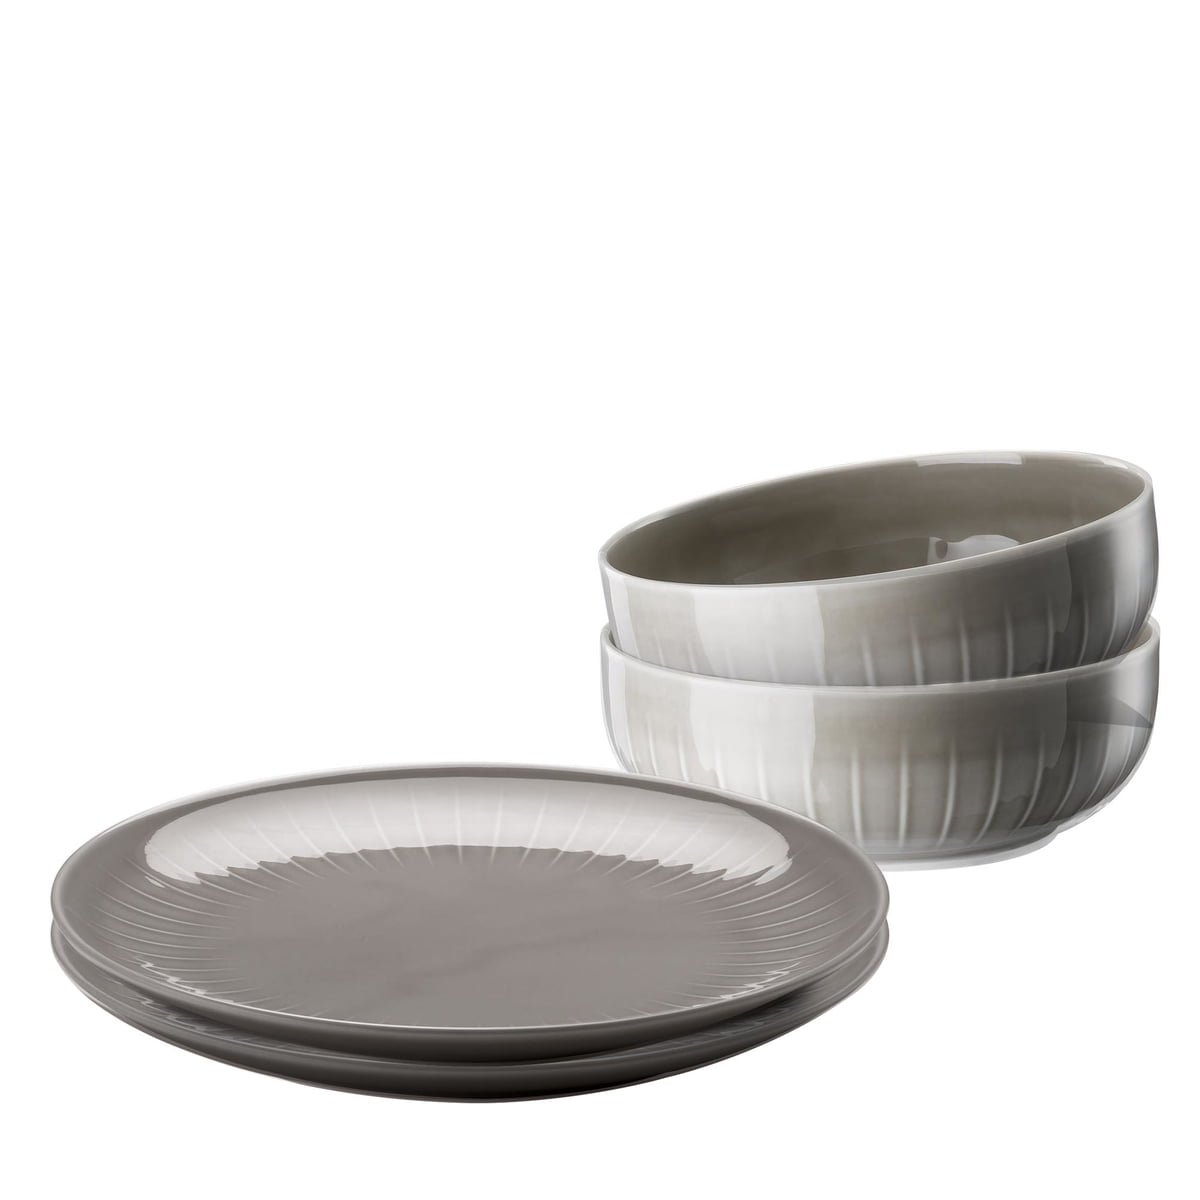 joyn dinnerware set grey by arzberg connox. Black Bedroom Furniture Sets. Home Design Ideas